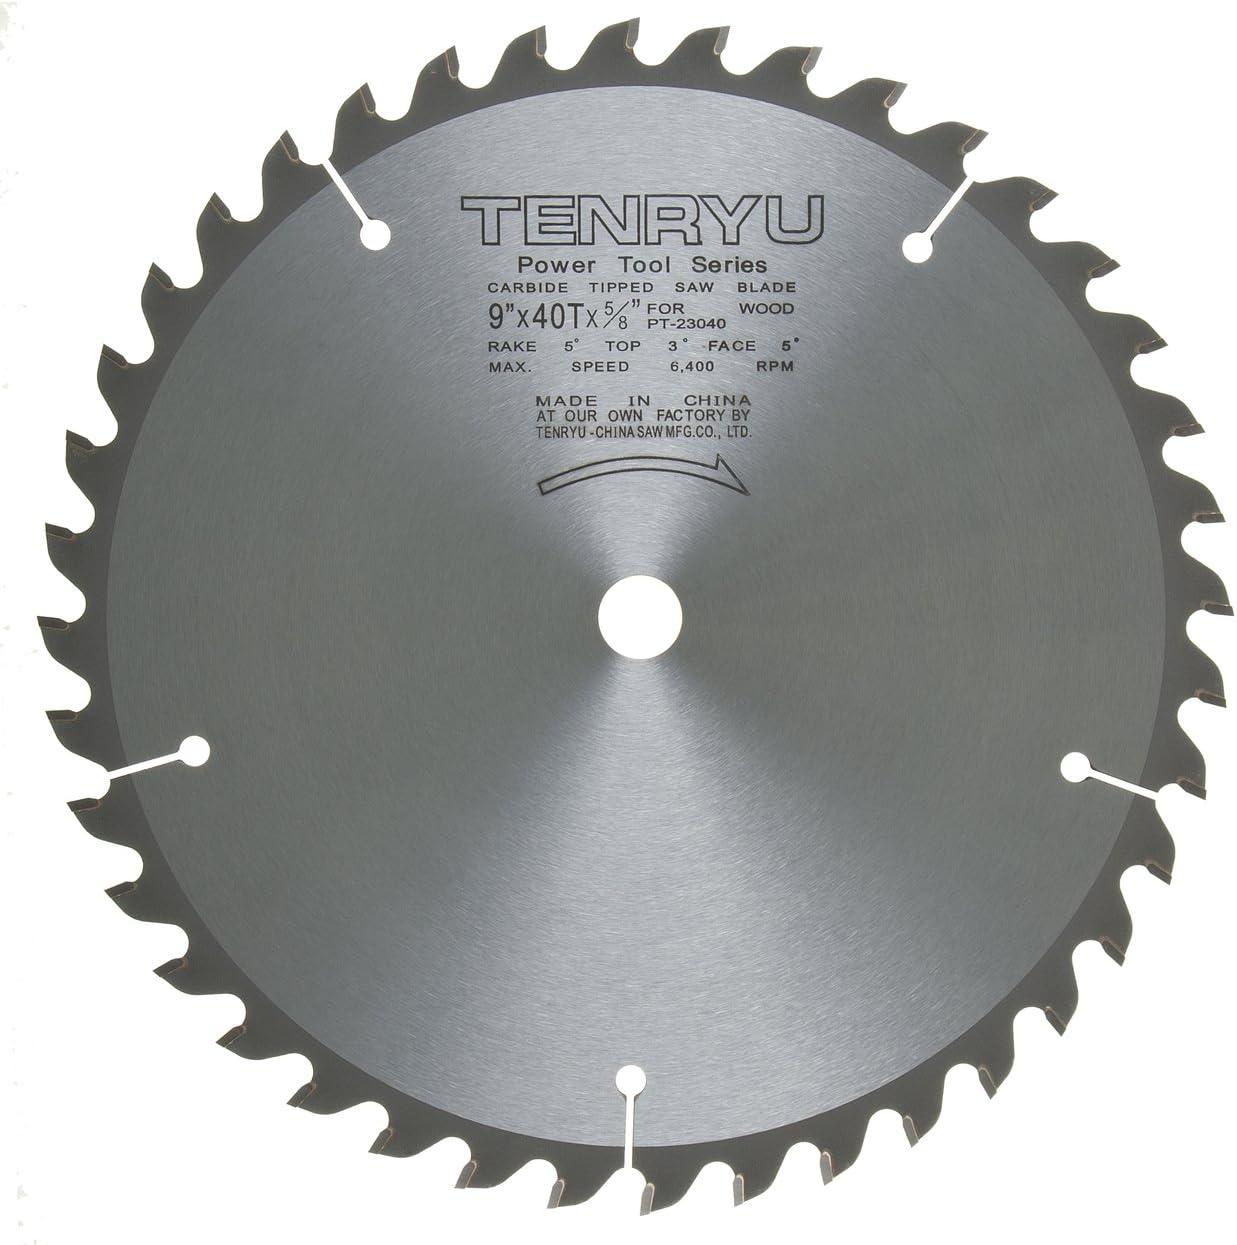 Tenryu PT-23040 9